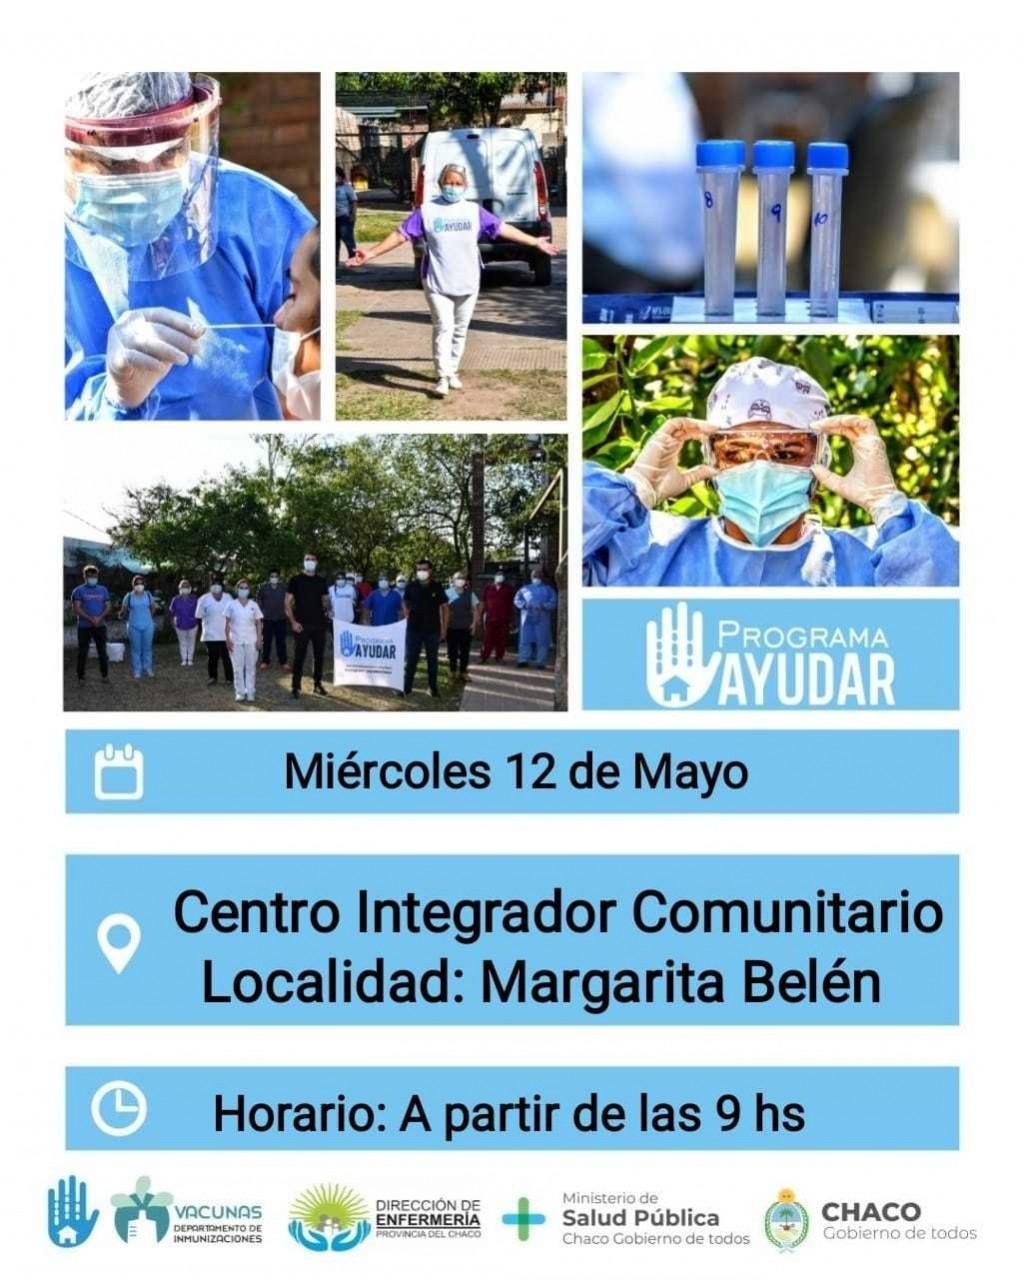 COVID-19: el Programa Ayudar llega a Margarita Belén